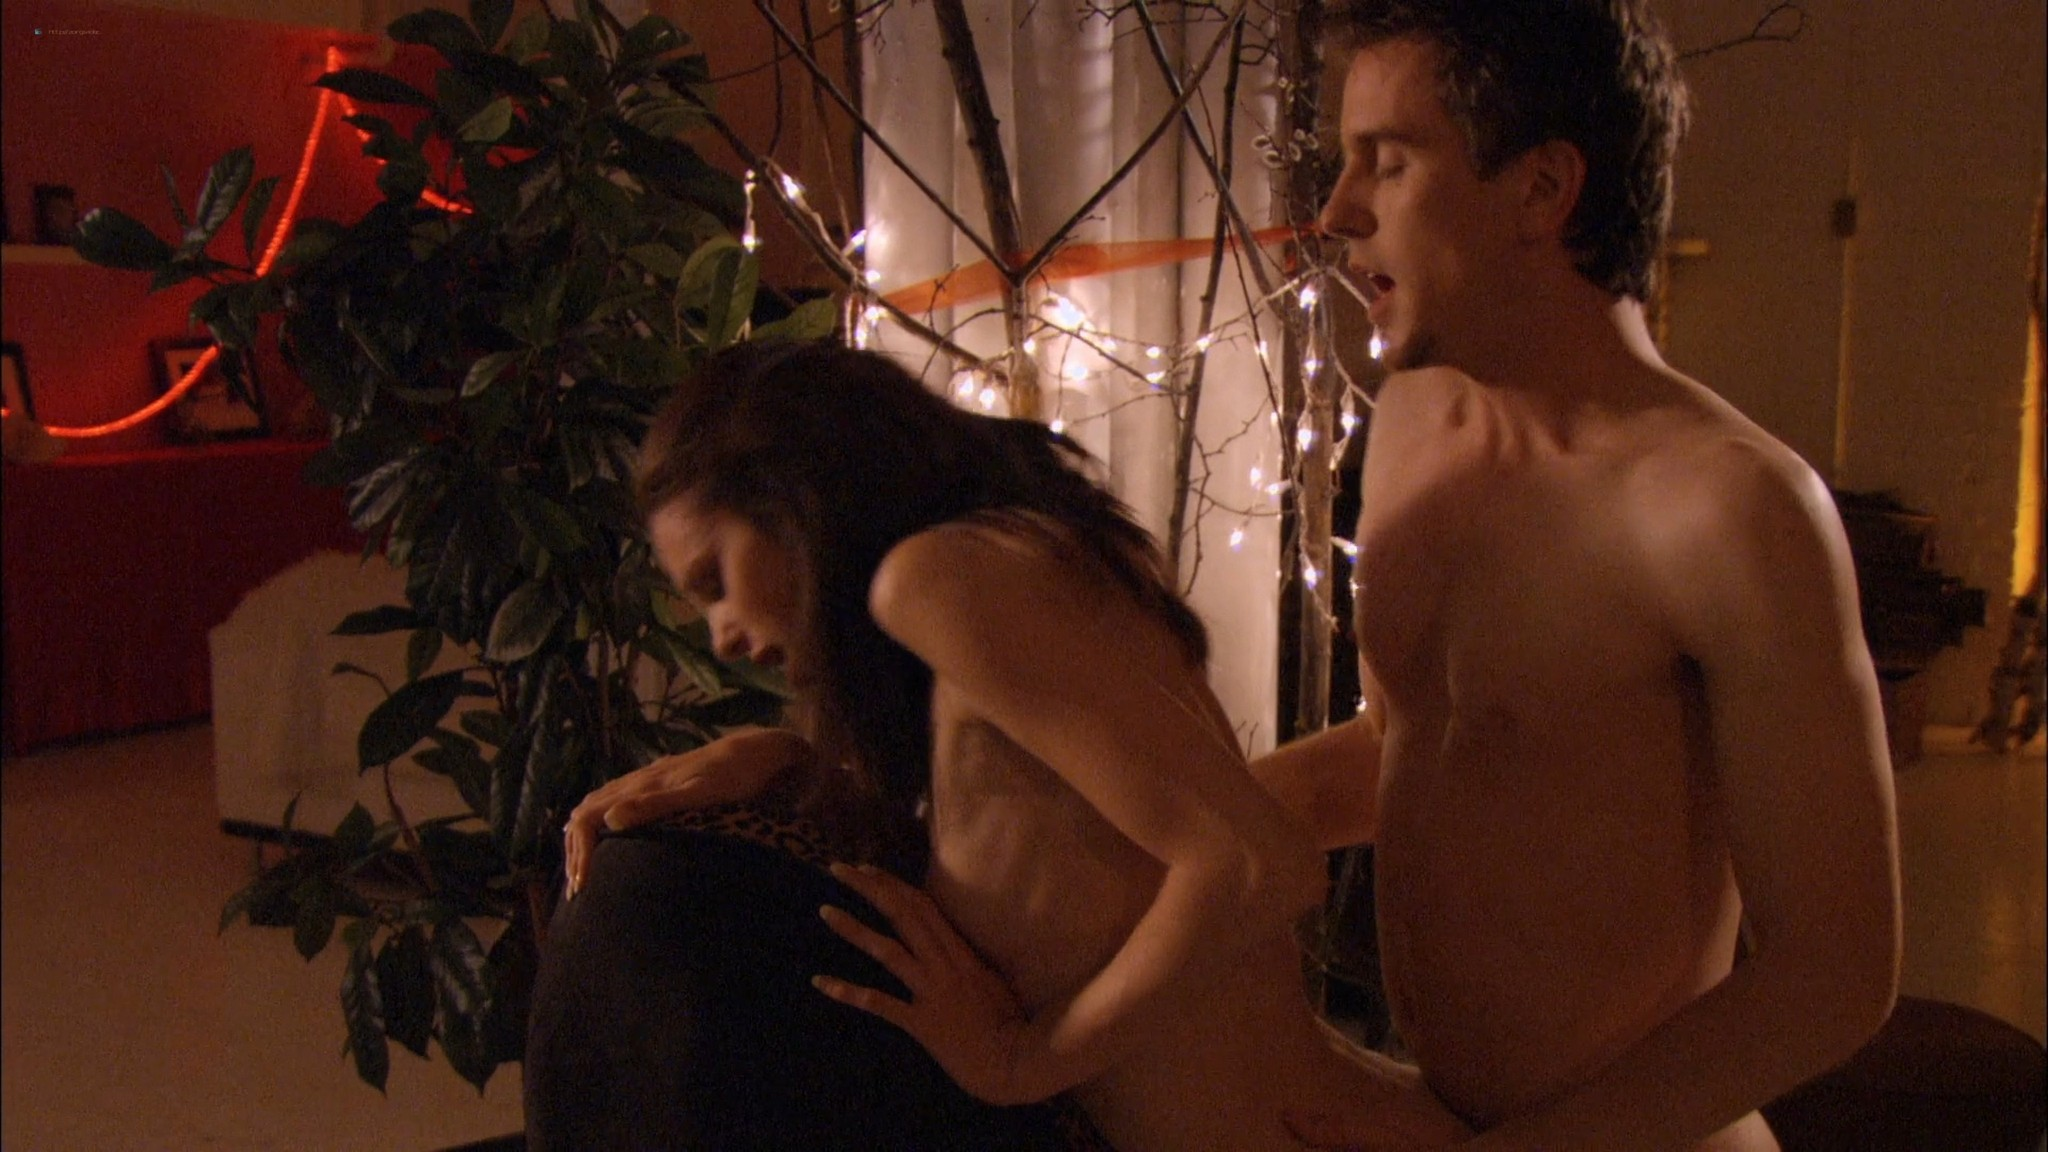 Lana Tailor nude sex Albina Nahar Denise Cobar nude sex Lingerie 2010 HD 1080p 010